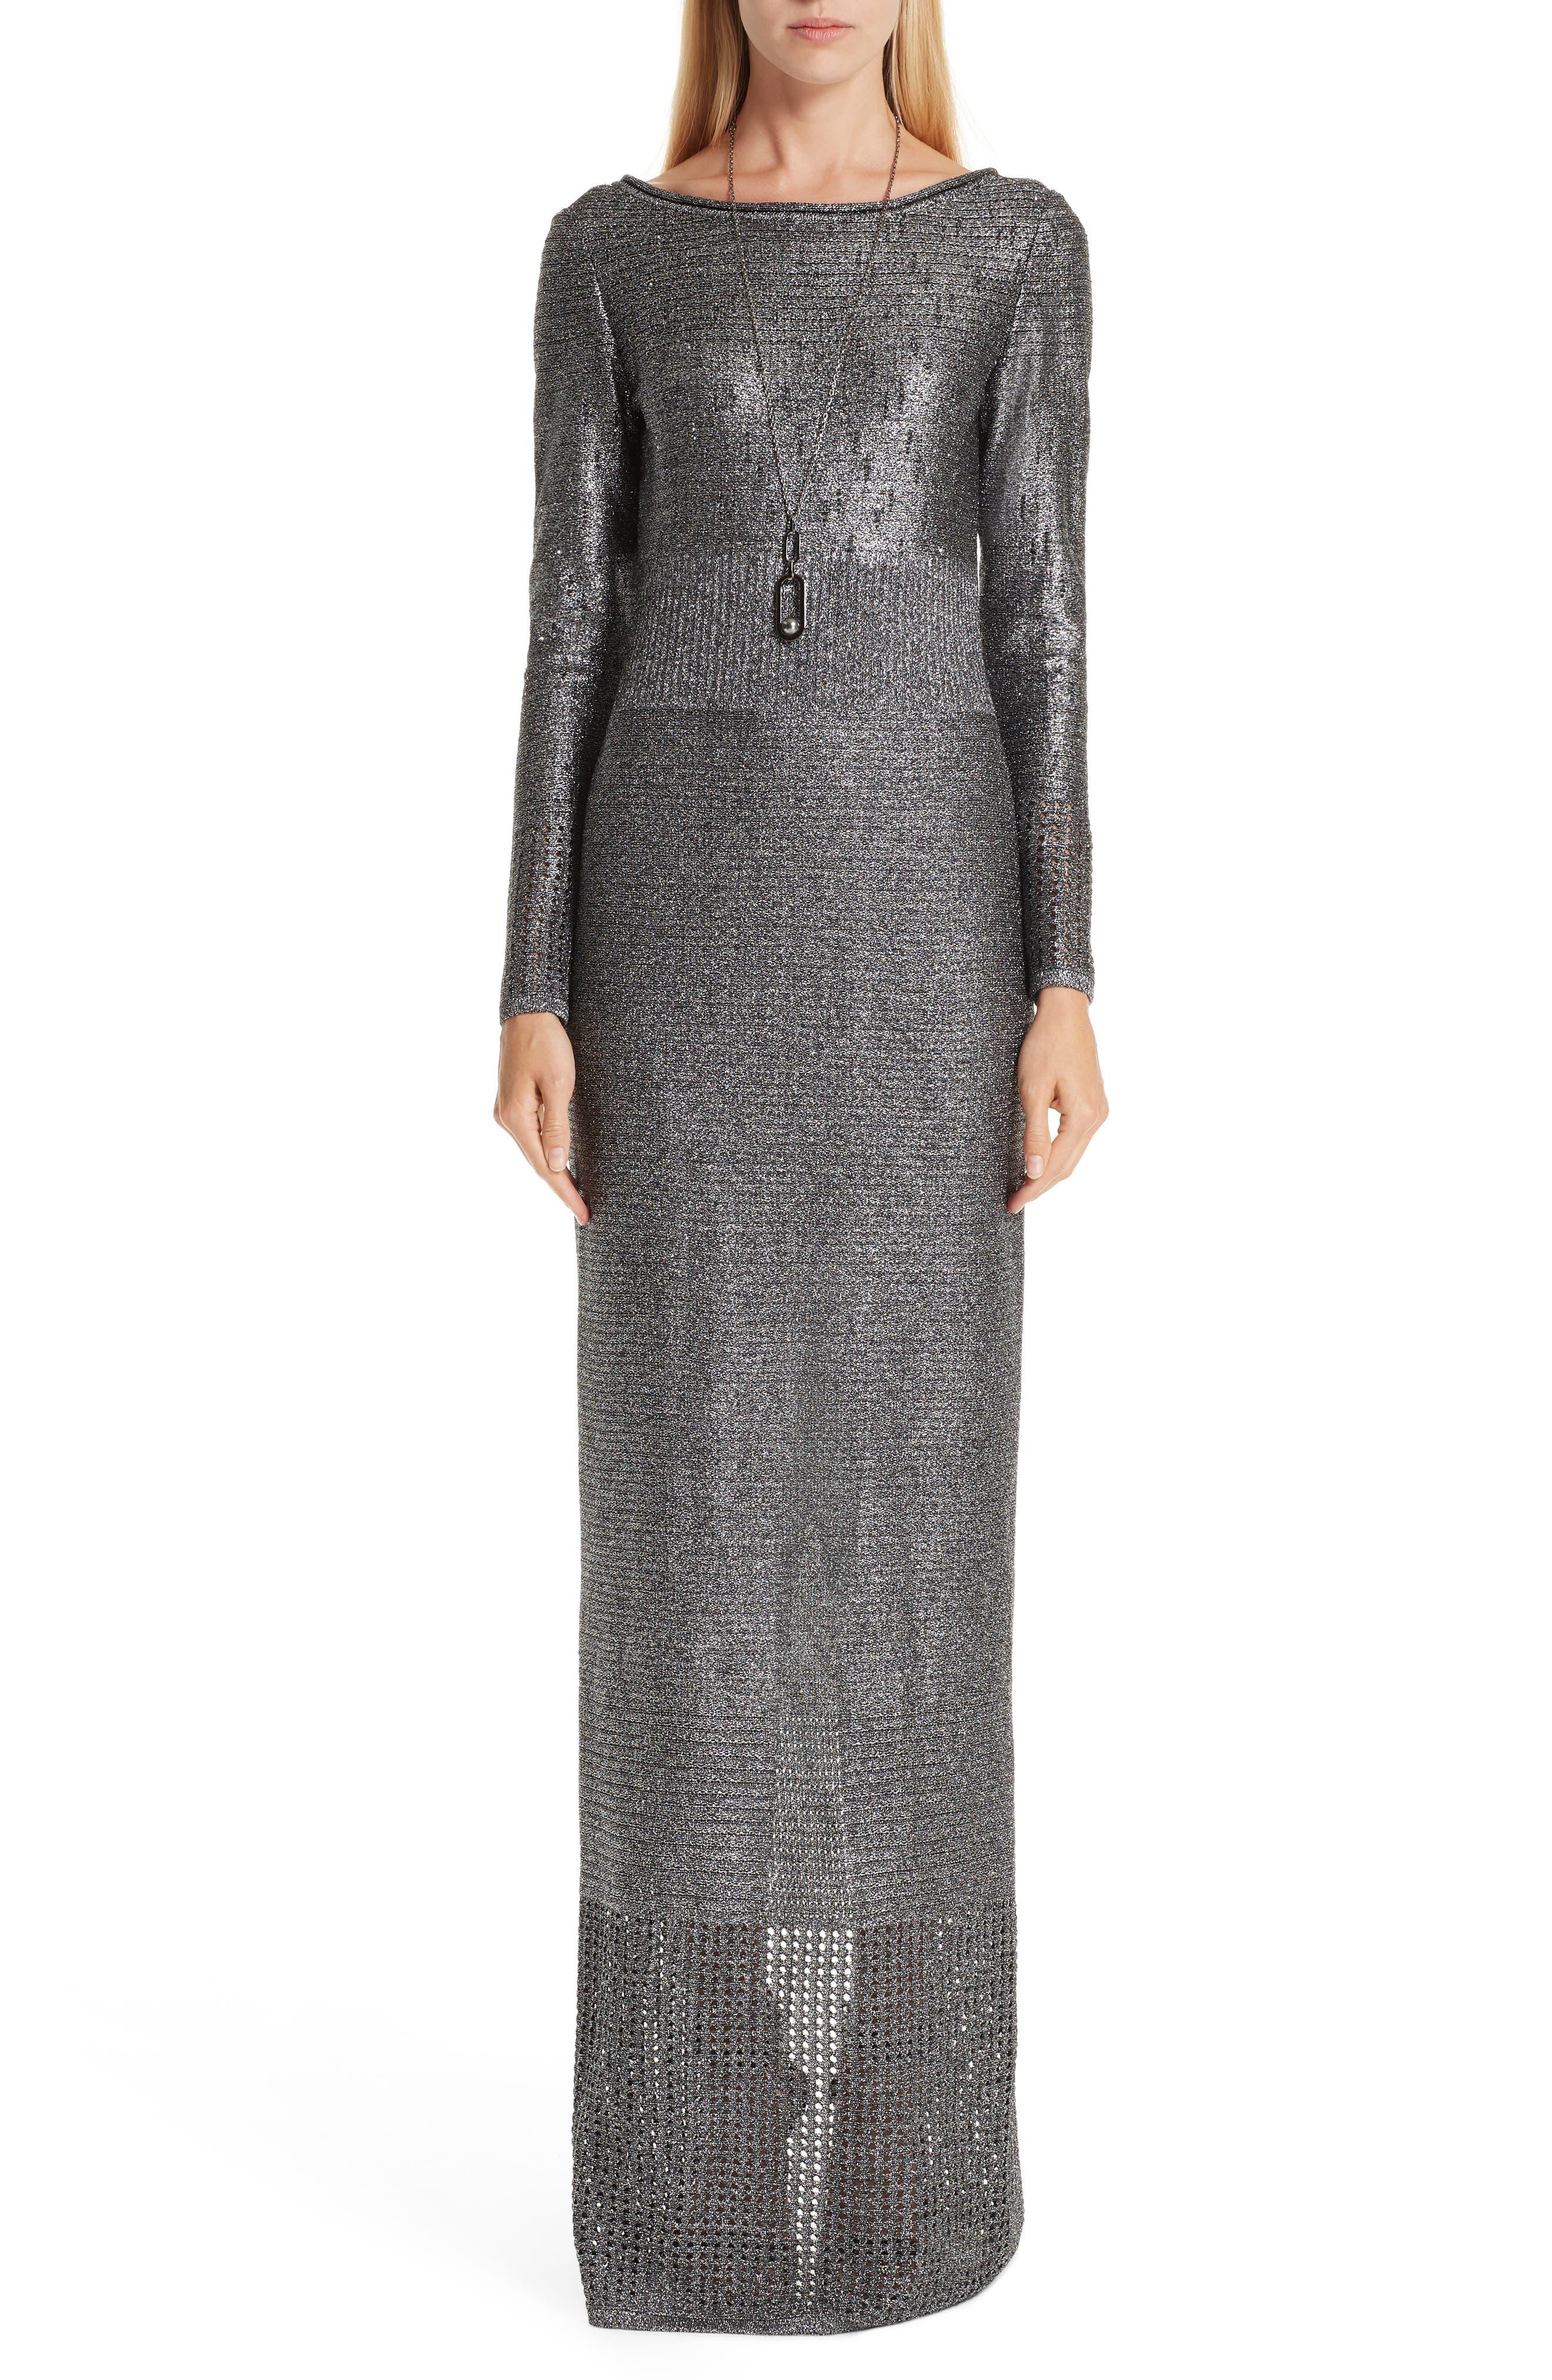 ST. JOHN COLLECTION, Metallic Plaited Mixed Knit Gown, Main thumbnail 1, color, GUNMETAL/ CAVIAR